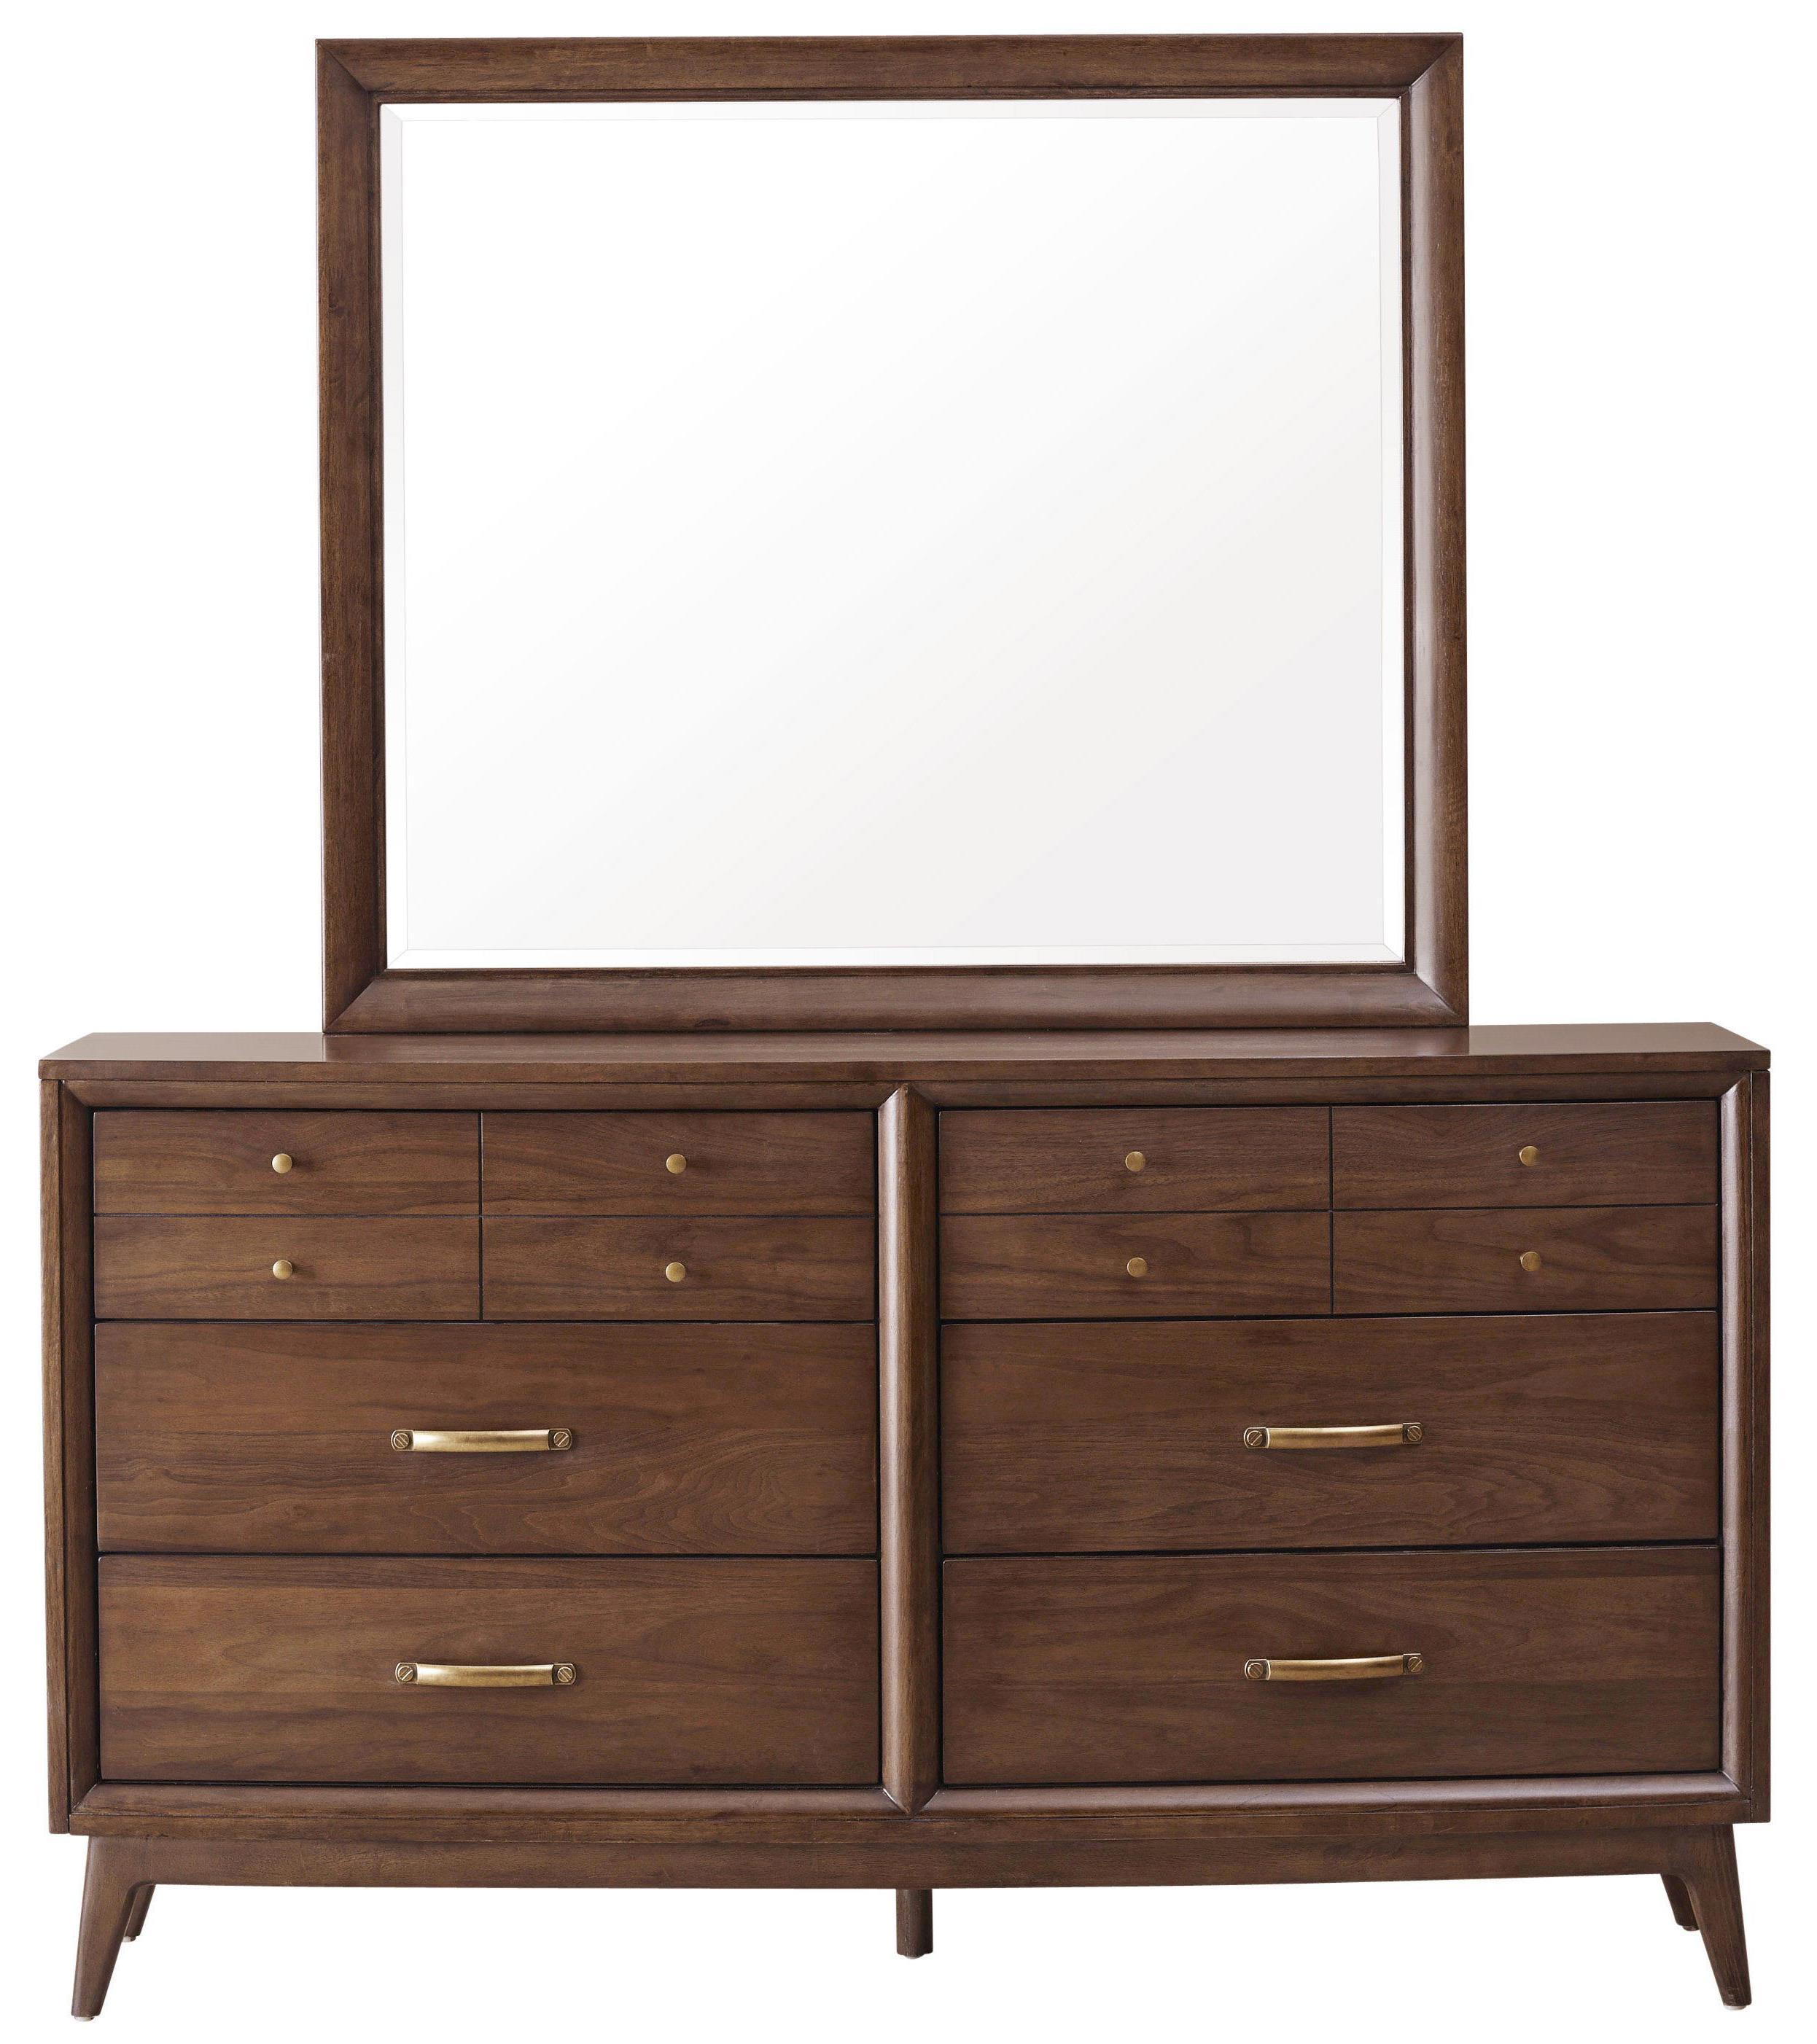 Pulaski Furniture Modern Harmony Dresser & Mirror Set - Item Number: 403100+110